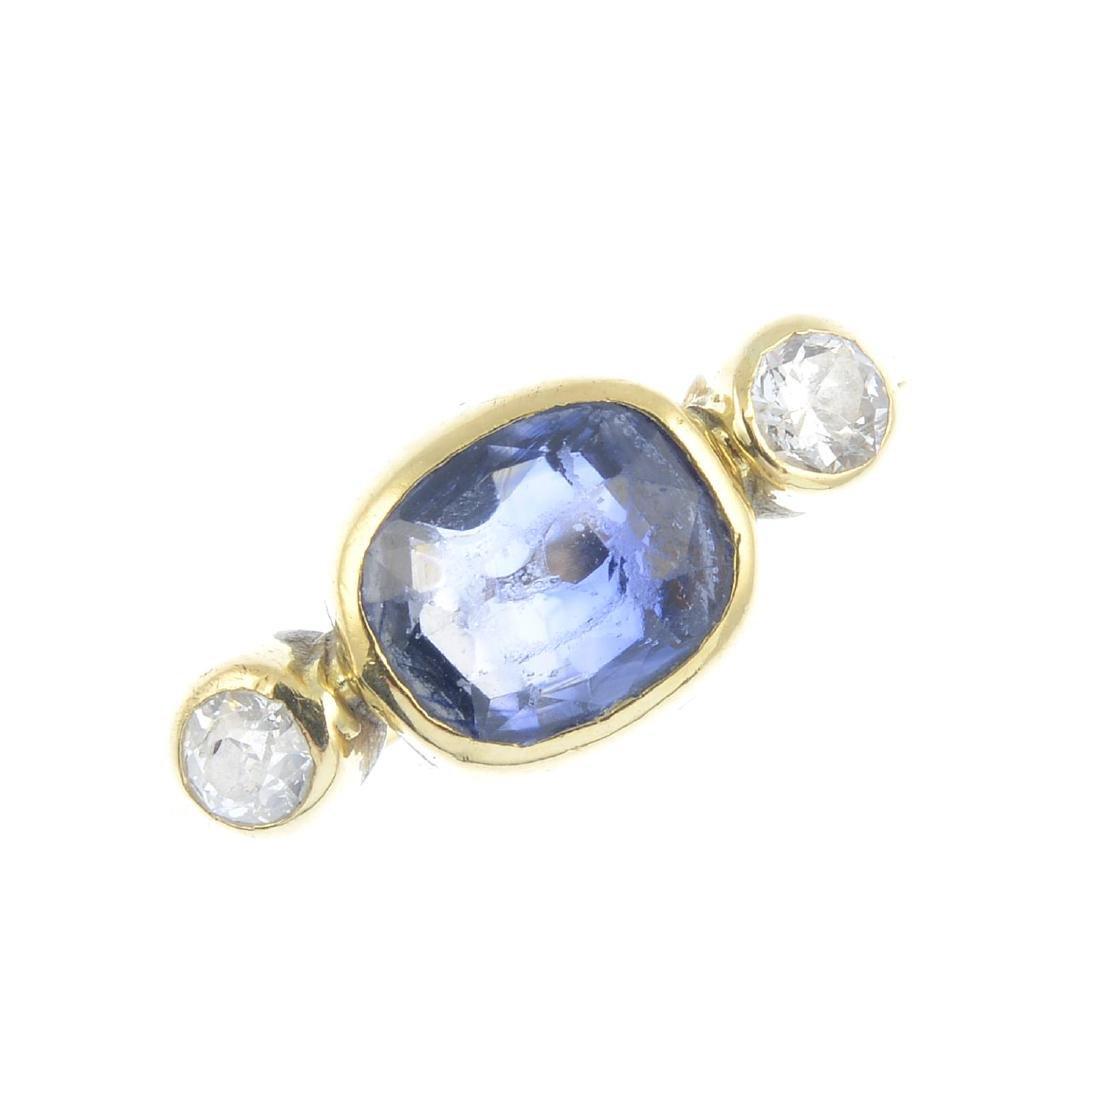 A sapphire and diamond ring. The cushion-shape sapphire